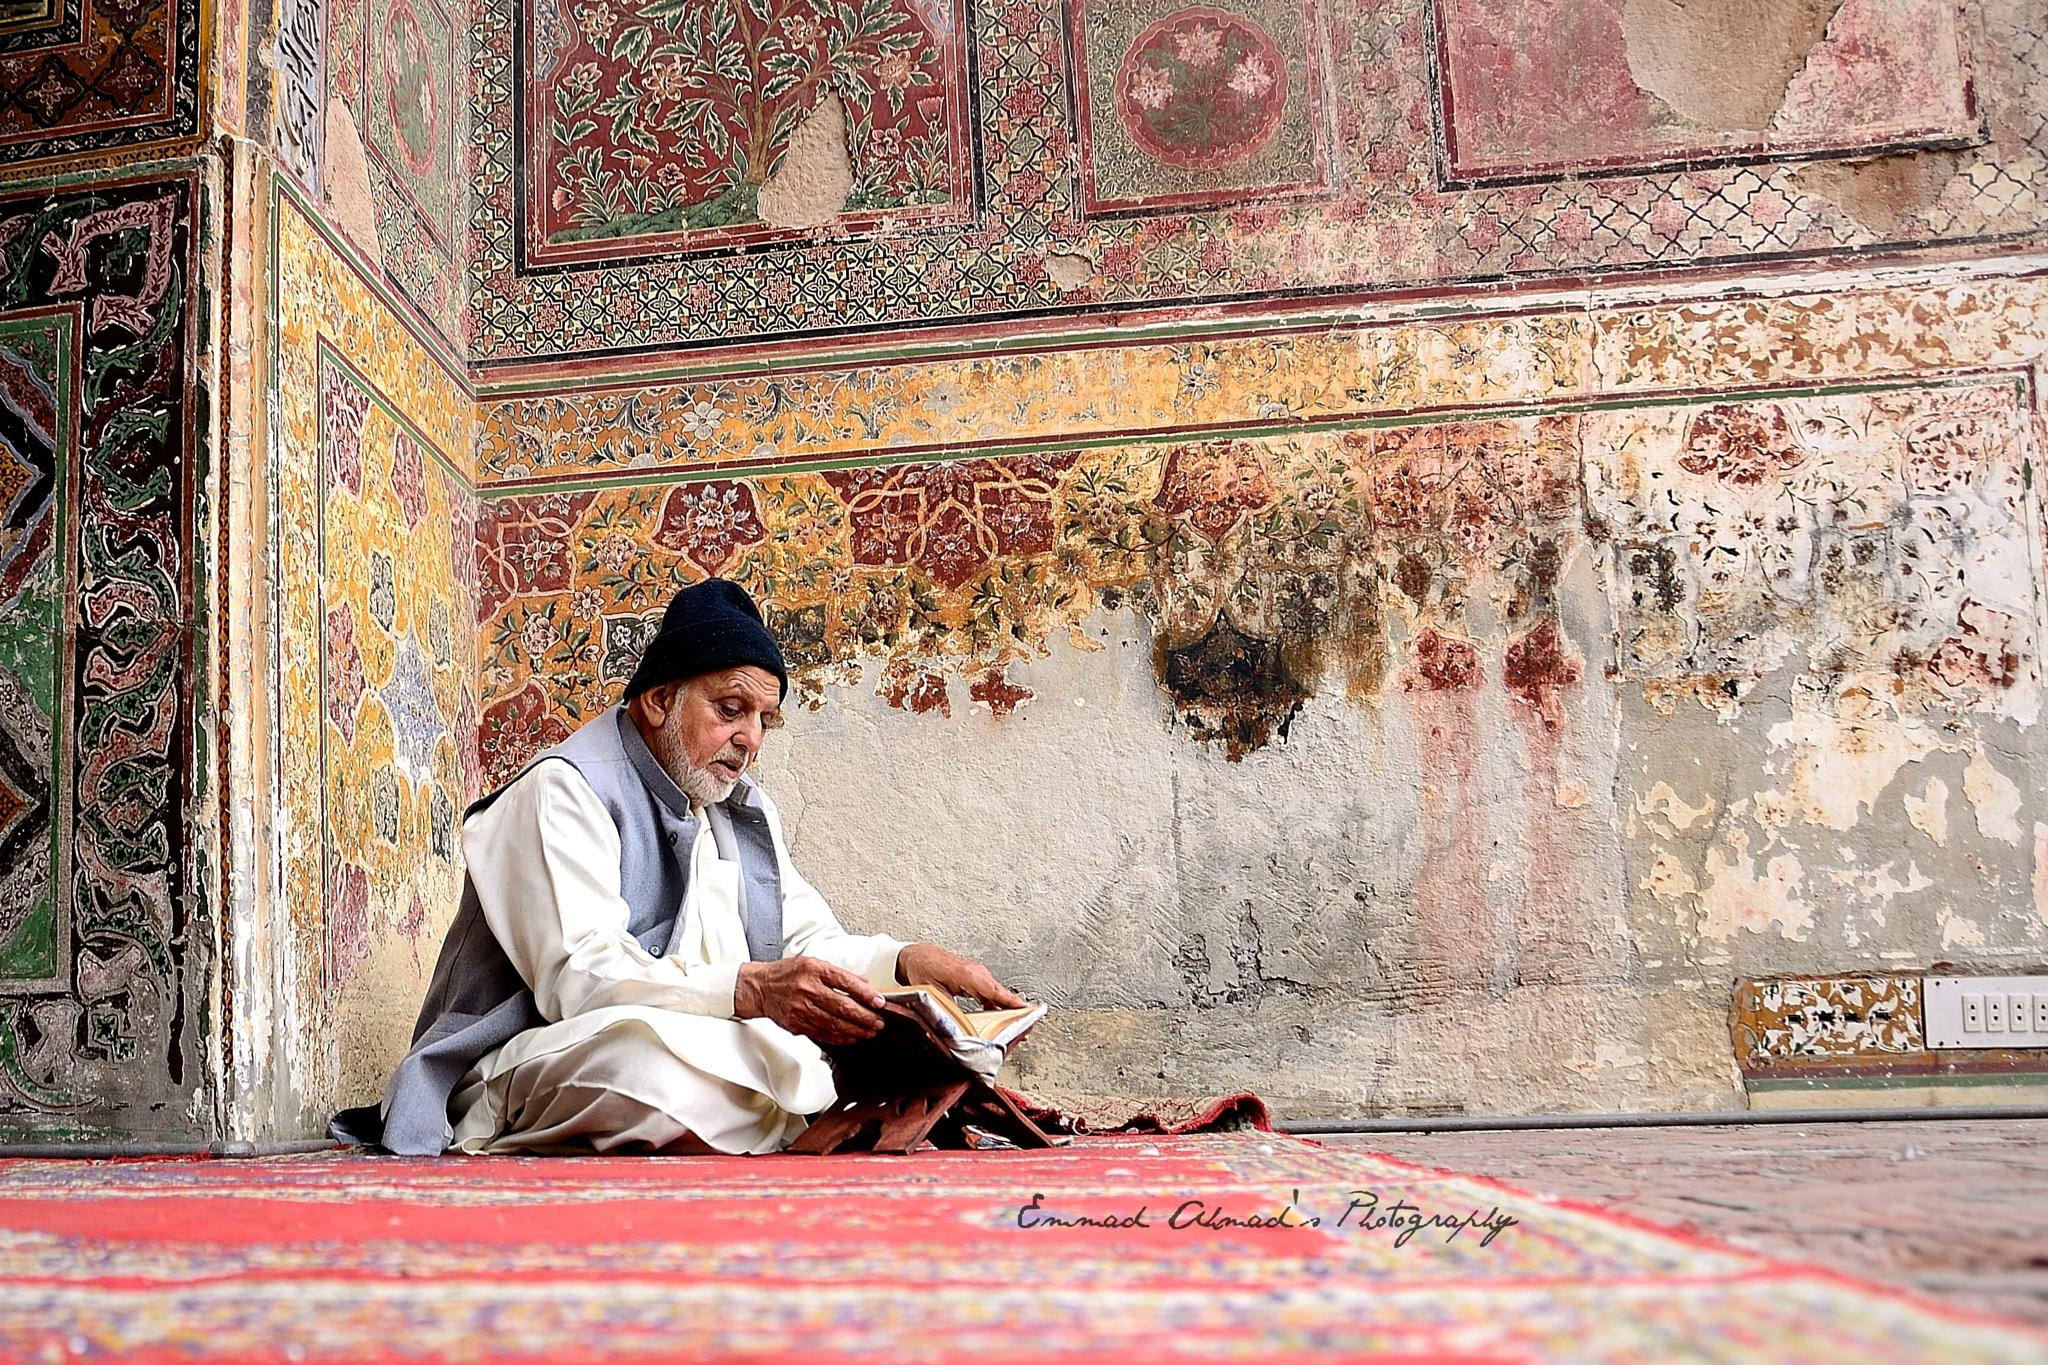 History fading away by Emmad Ahmad